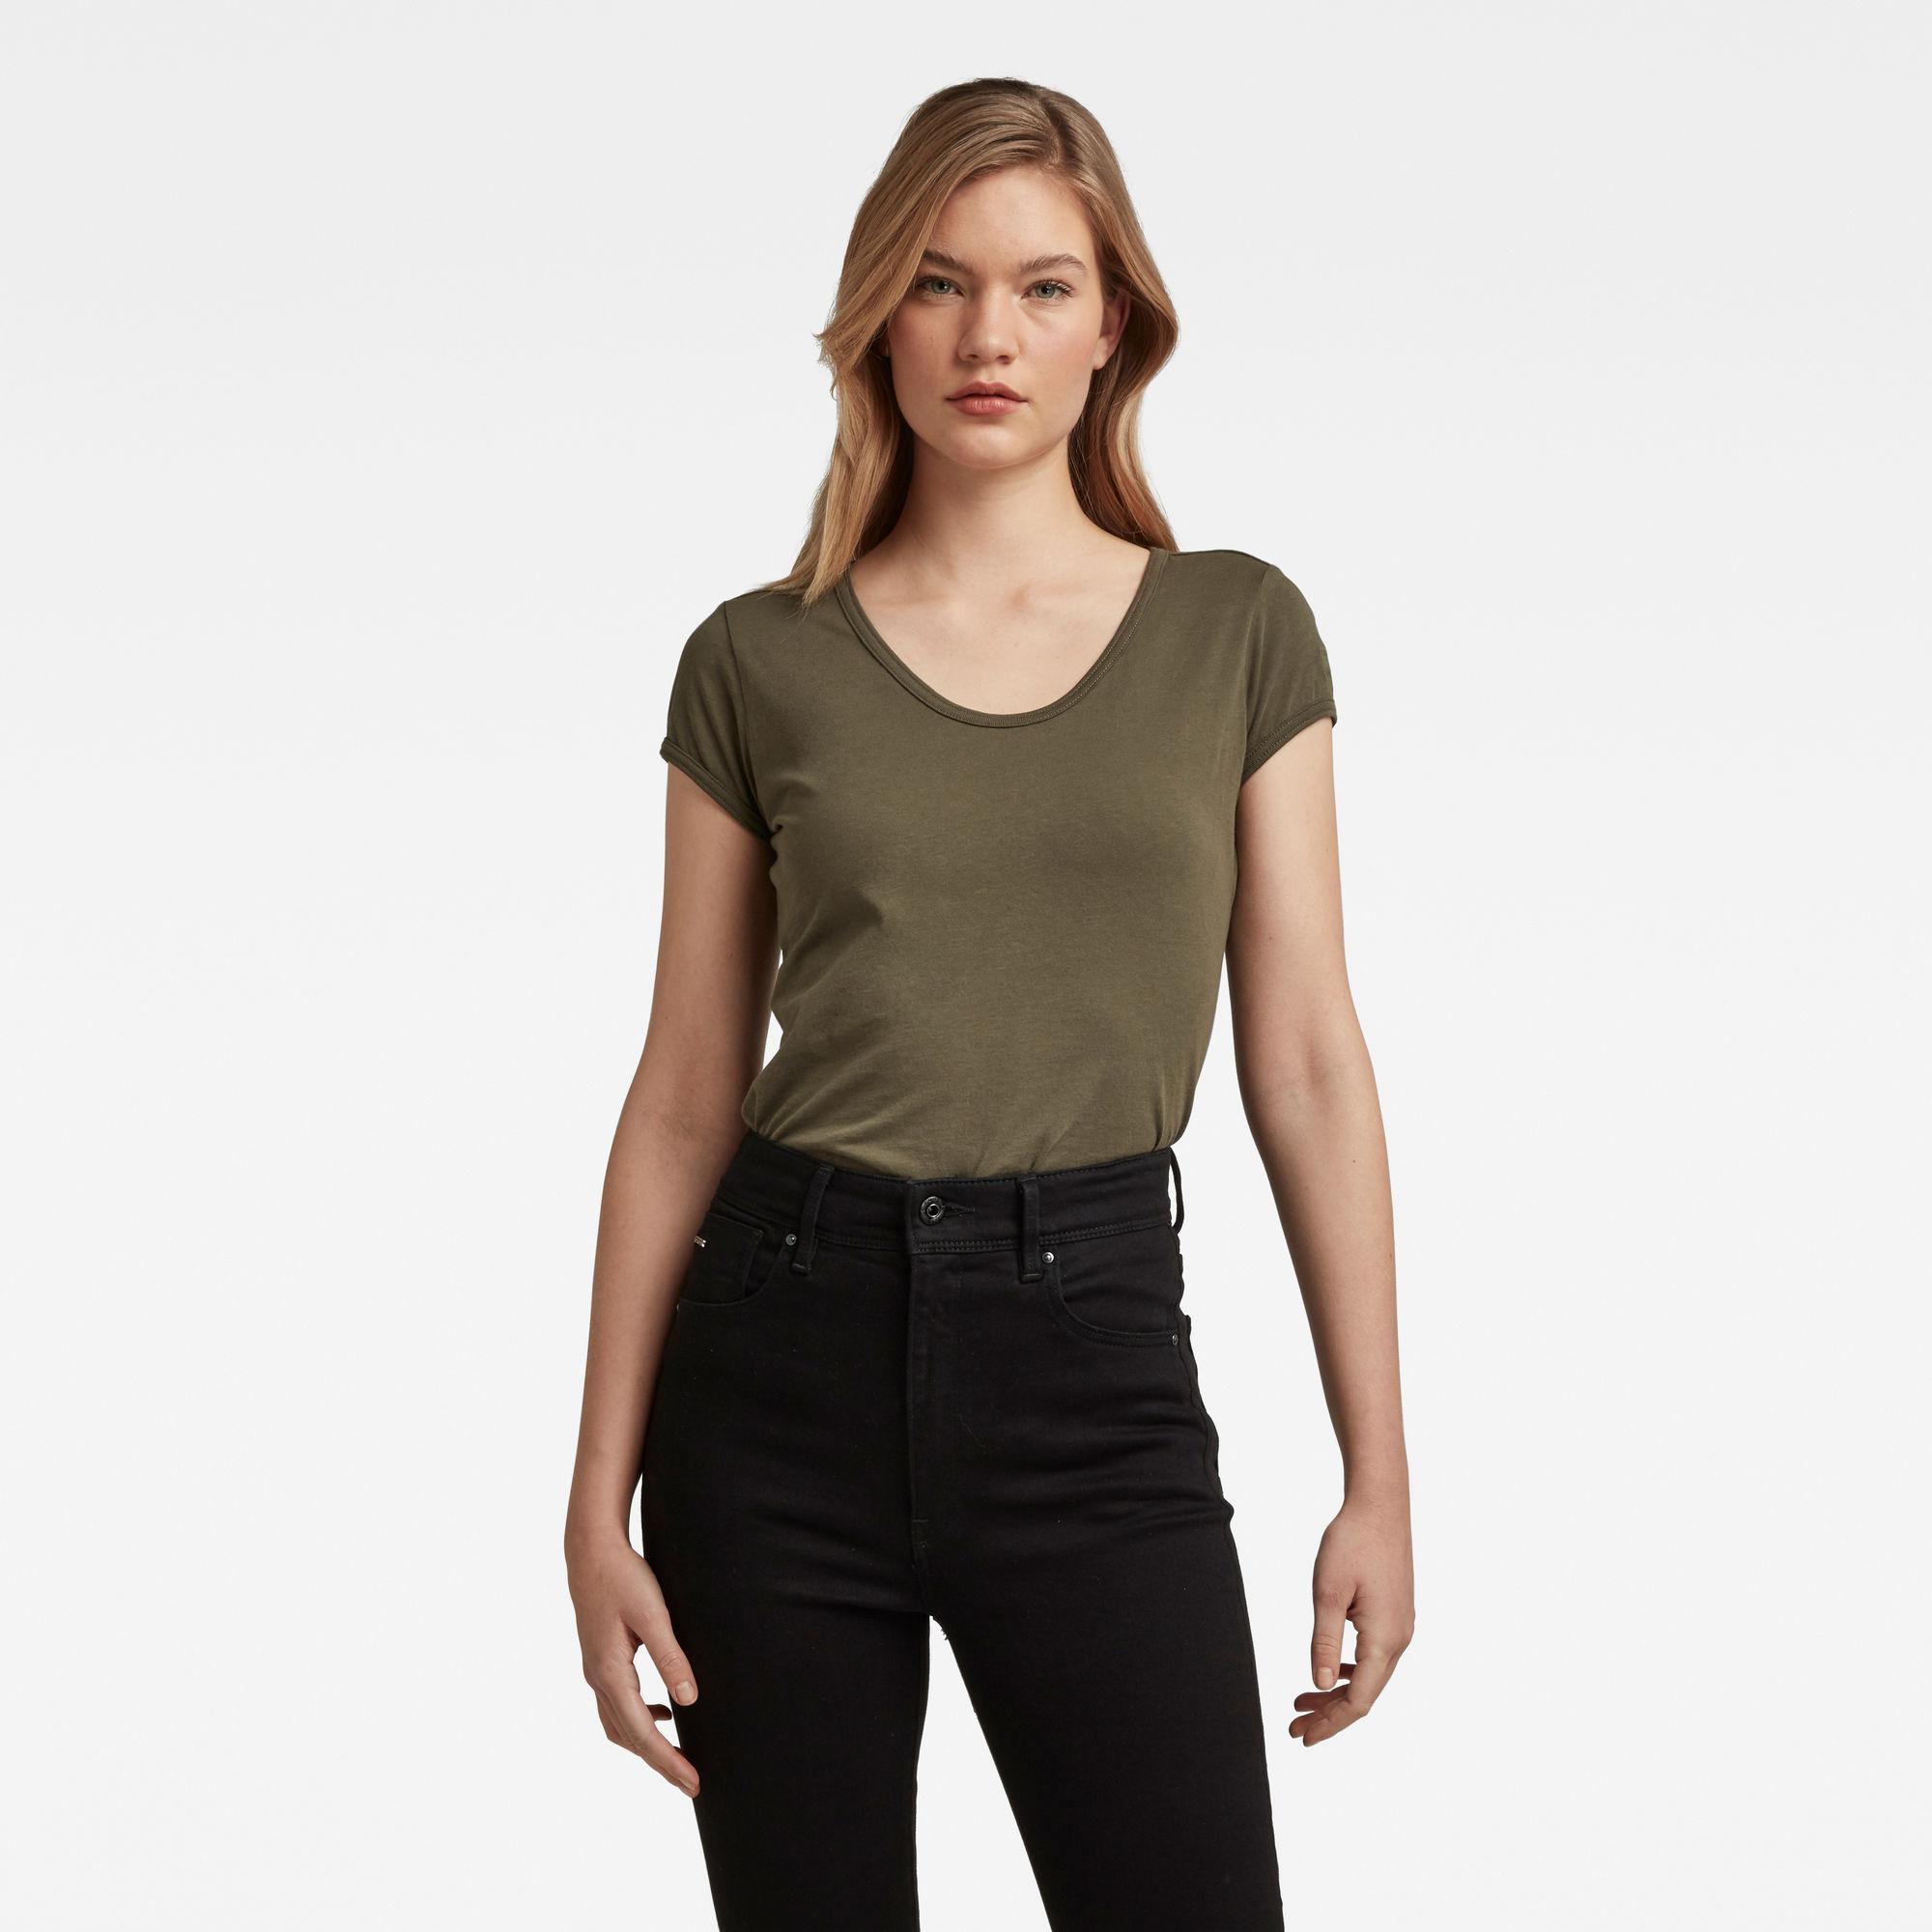 G-Star RAW Dames Core Eyben Slim T-Shirt Groen